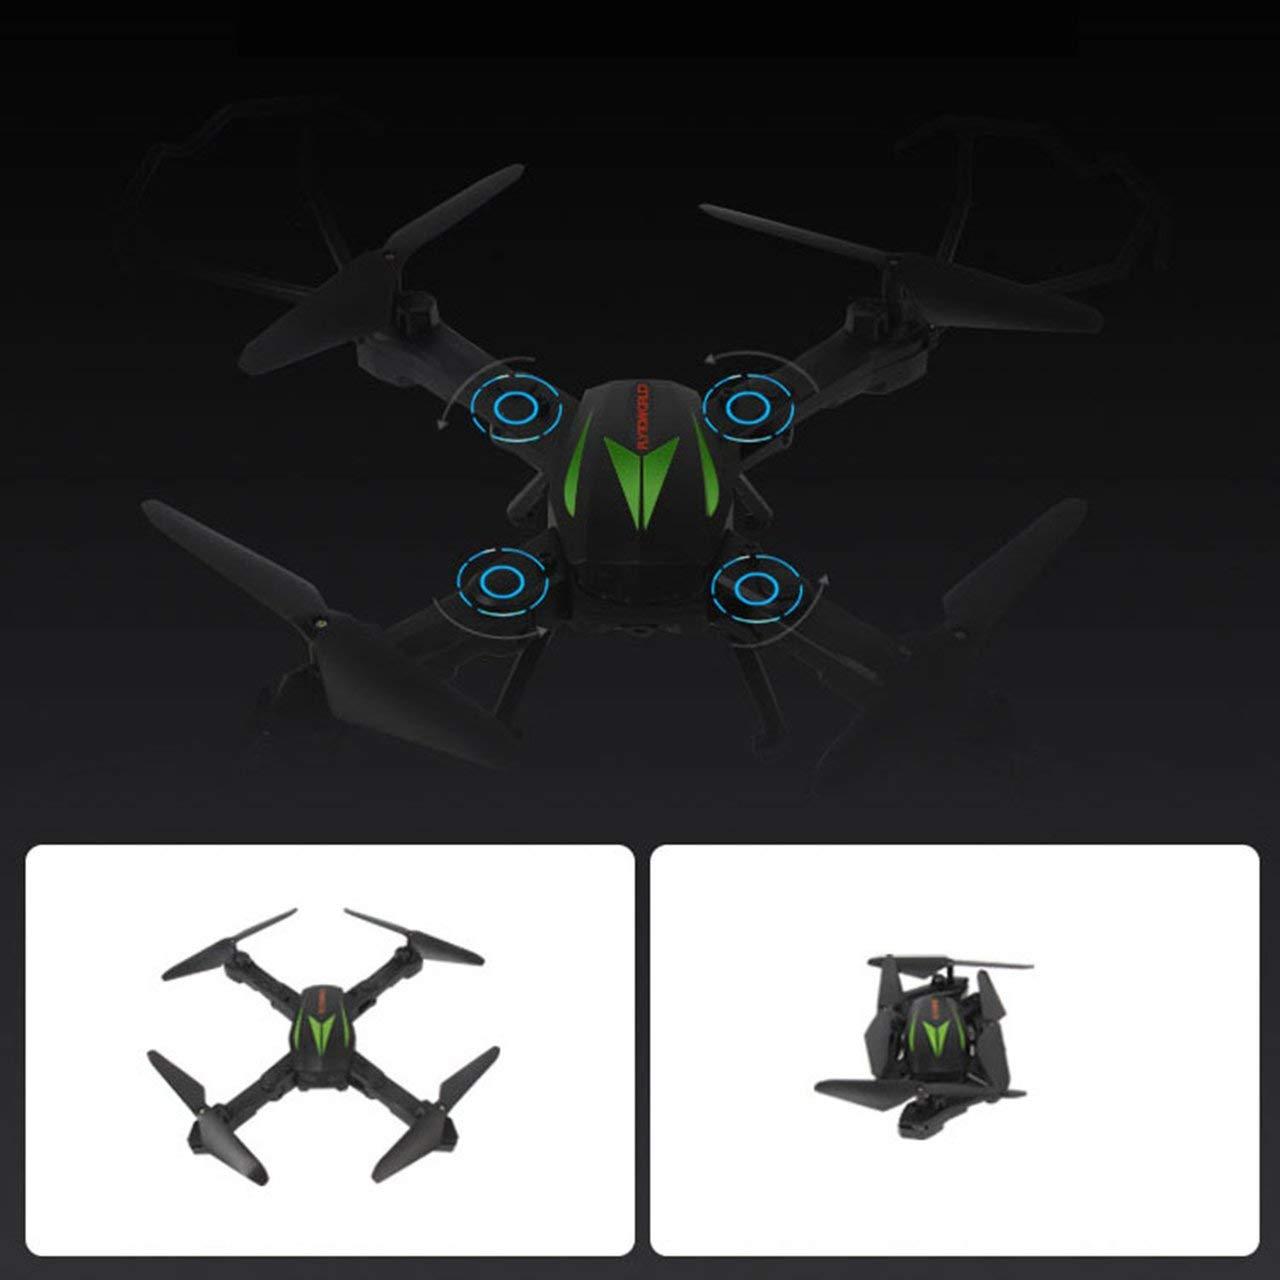 Jasnyfall F12W Mini Selfie WiFi FPV Faltbare Drone Drone Drone 720P Einstellbare Kamera Altitude Hold Schwarz-Orange 8784ab